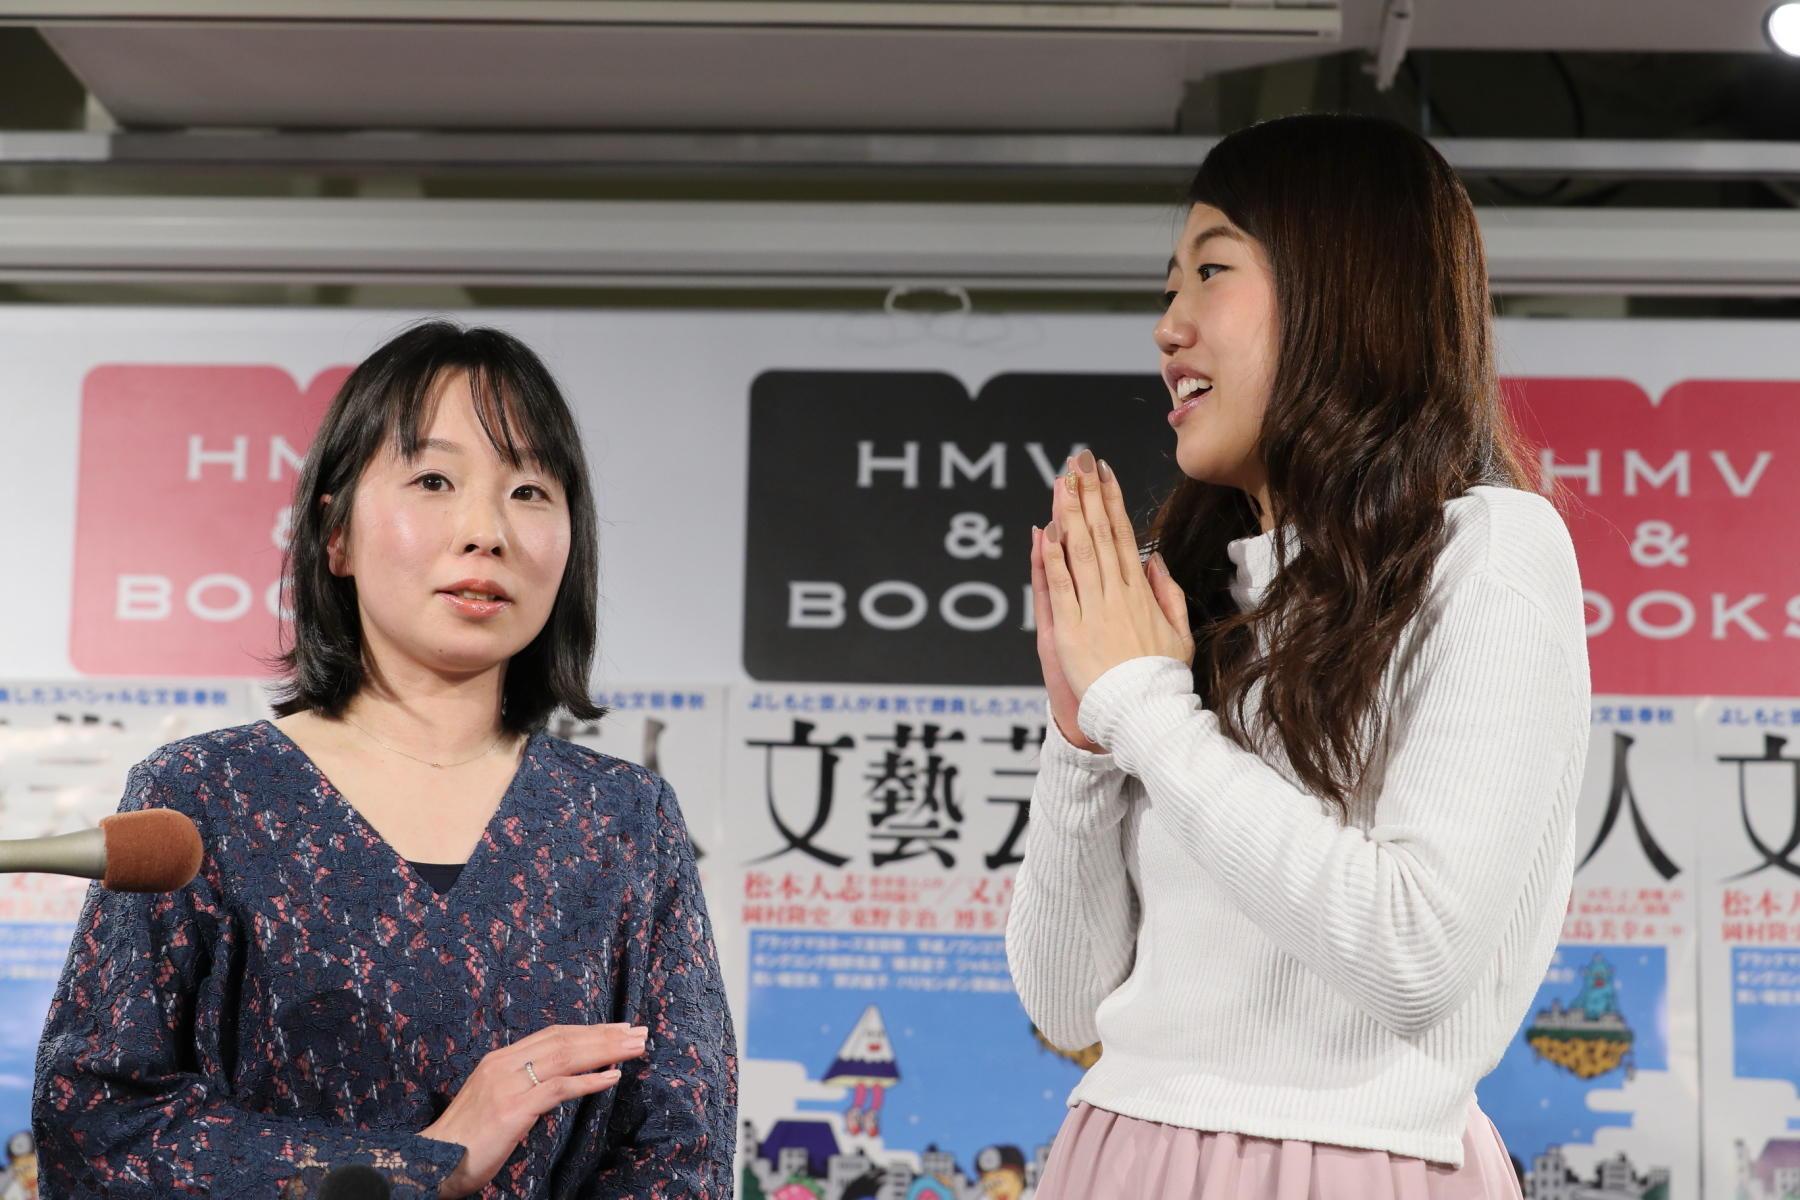 http://news.yoshimoto.co.jp/20170330195224-6124b5d243229f5682bb0634580a81e5c12e21bb.jpg